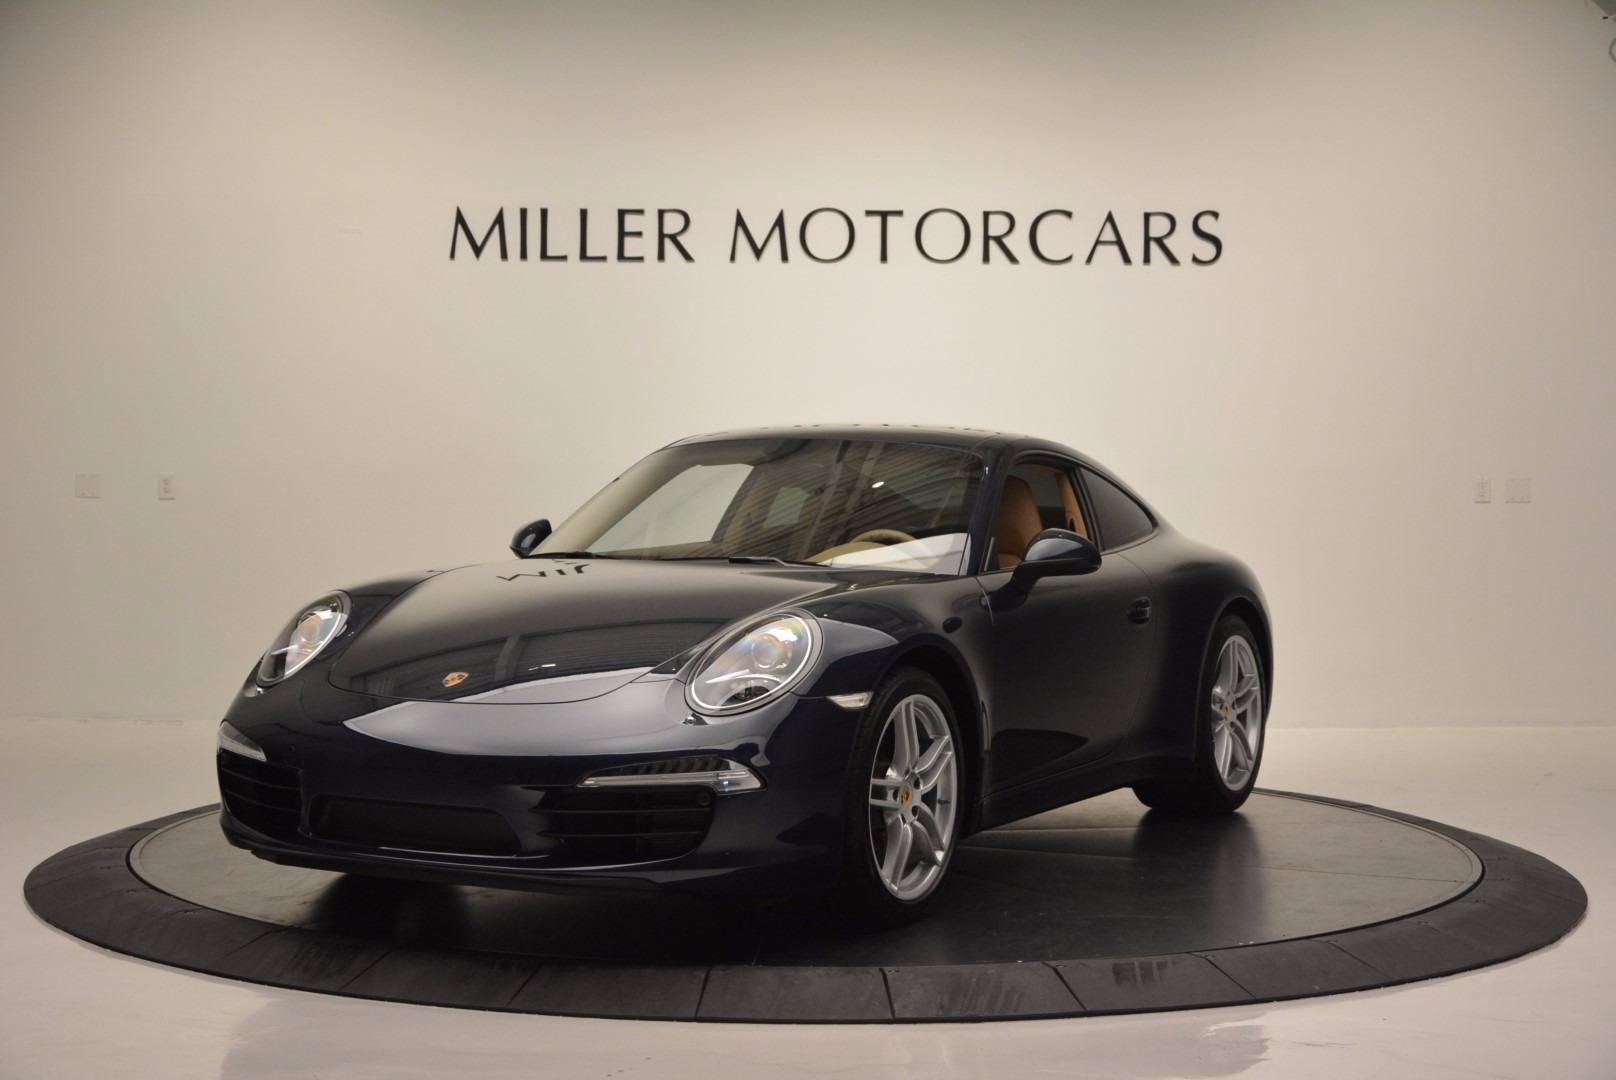 Used 2014 Porsche 911 Carrera for sale Sold at Maserati of Greenwich in Greenwich CT 06830 1